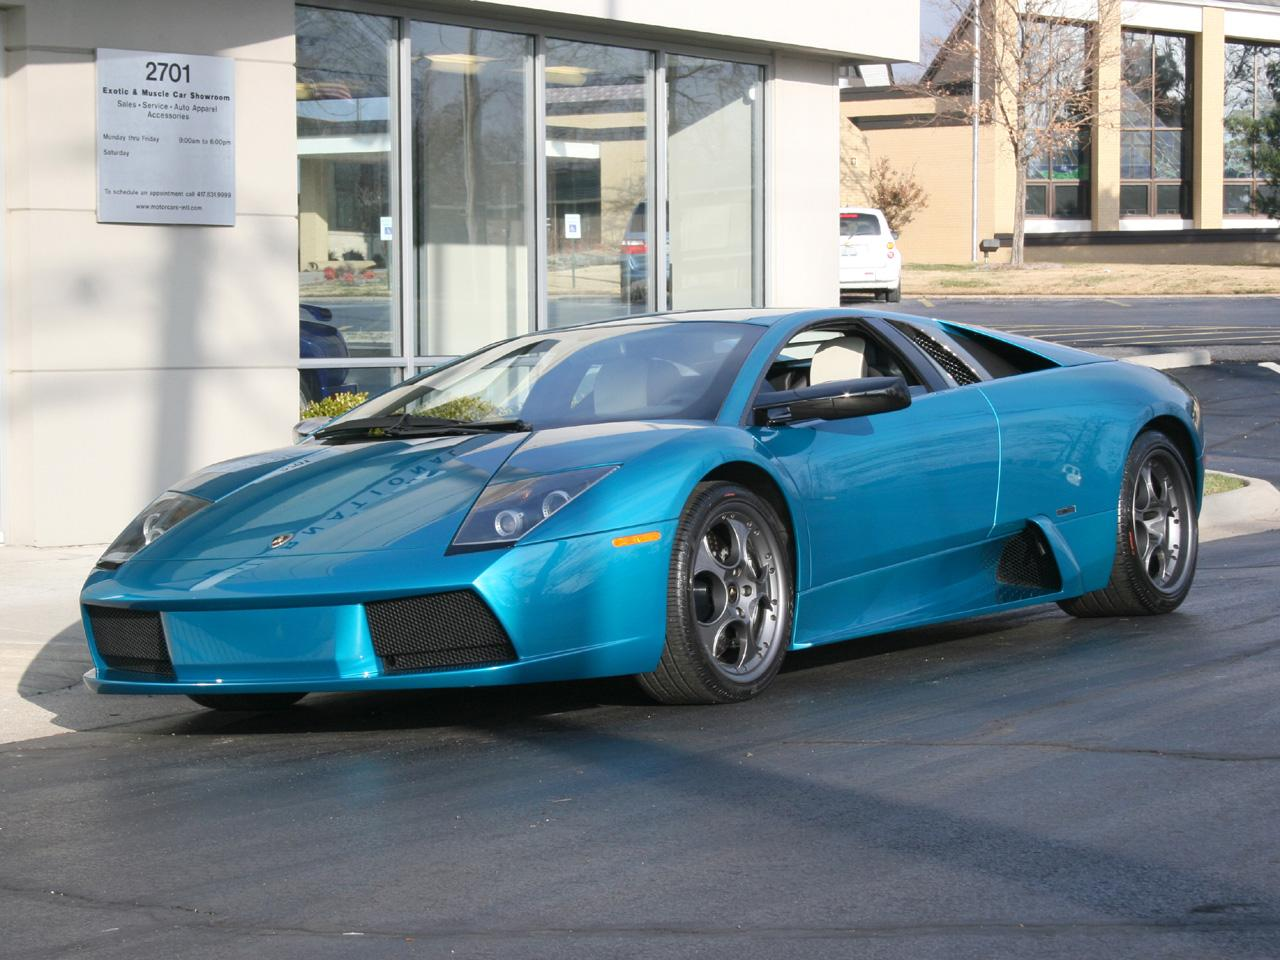 Autos, Lkw & Busse Lamborghini Murciélago 40th Anniversary 2003 Auto- & Verkehrsmodelle